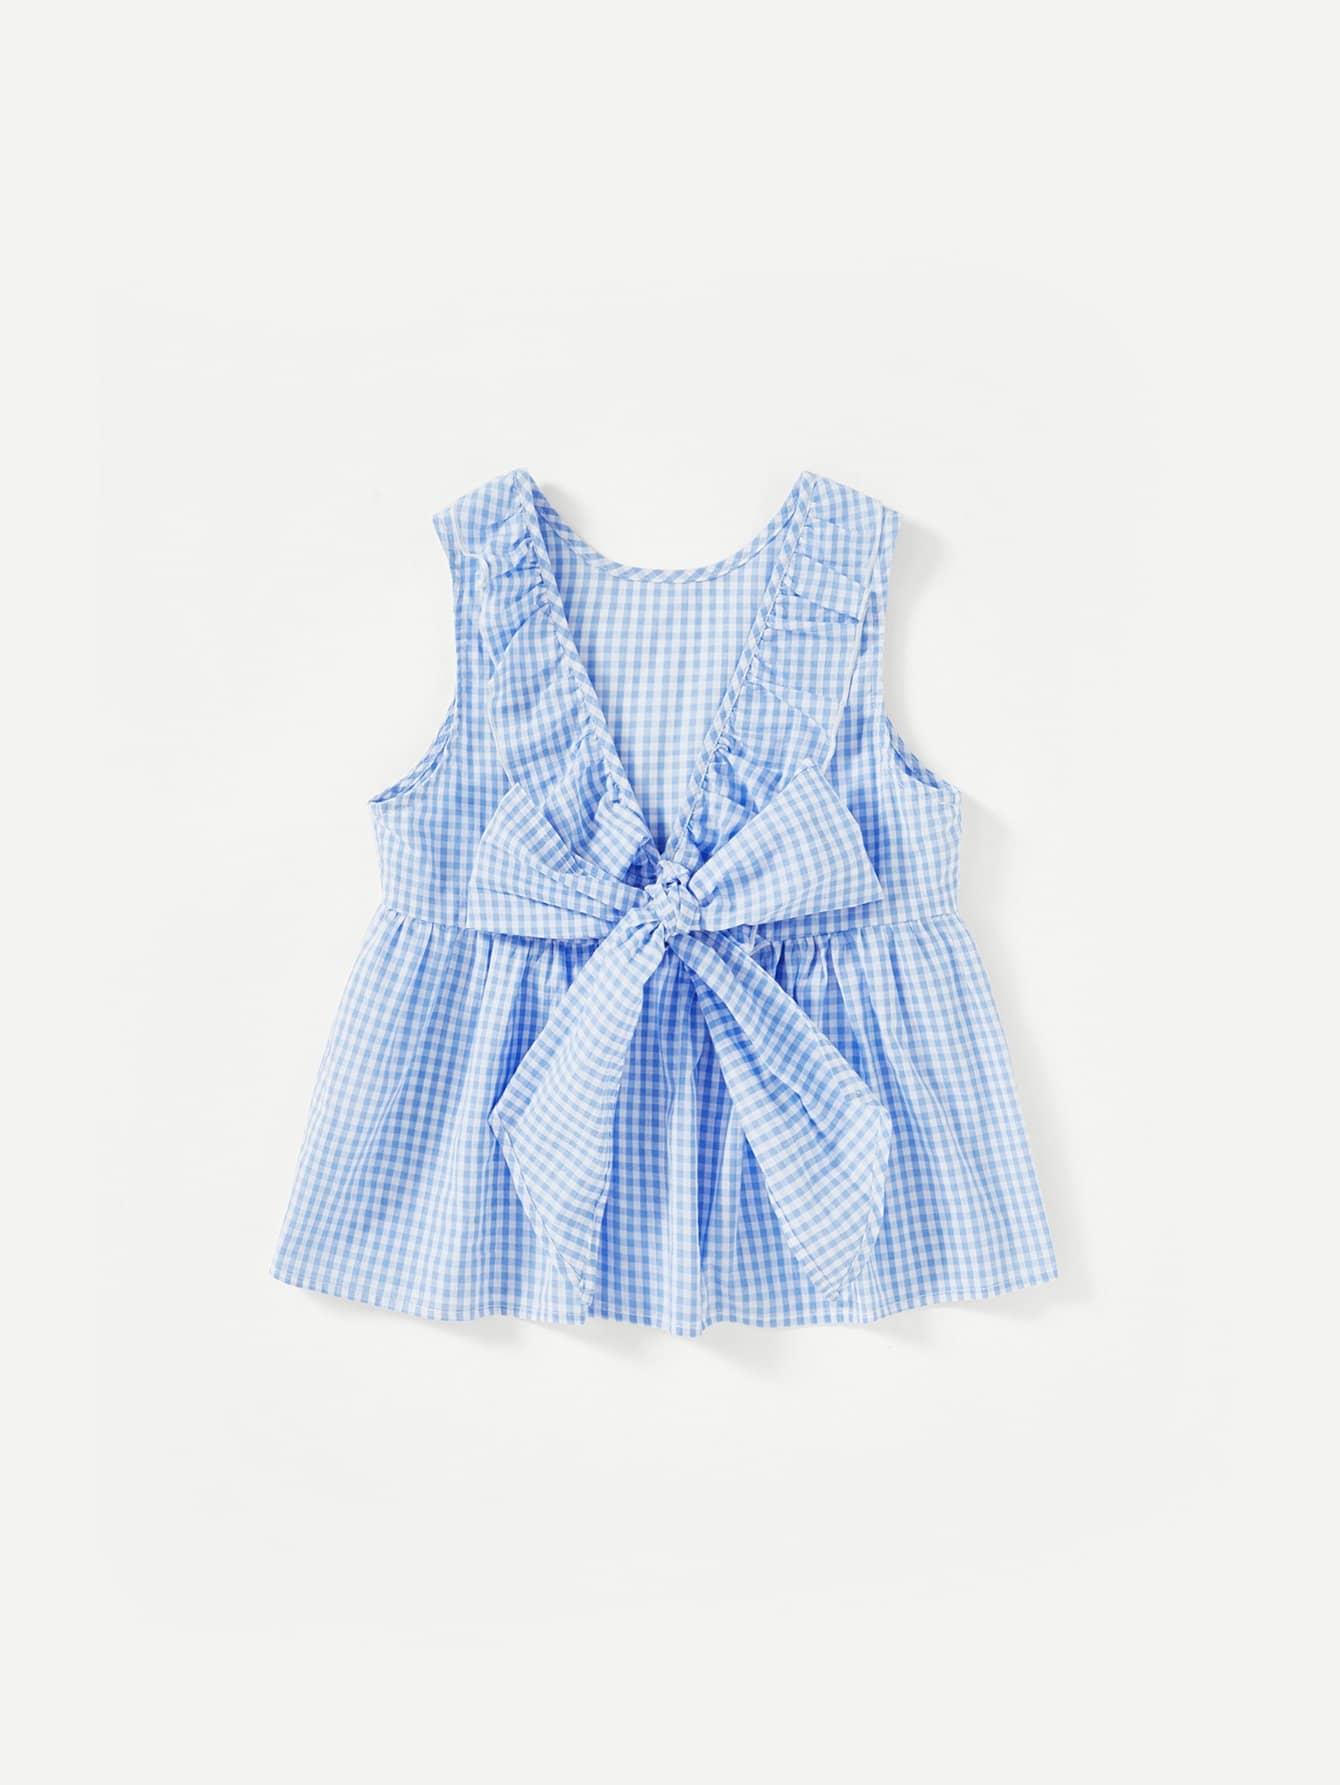 Tied Ruffle V-Back Gingham Smock Top raglan sleeve smock gingham dress